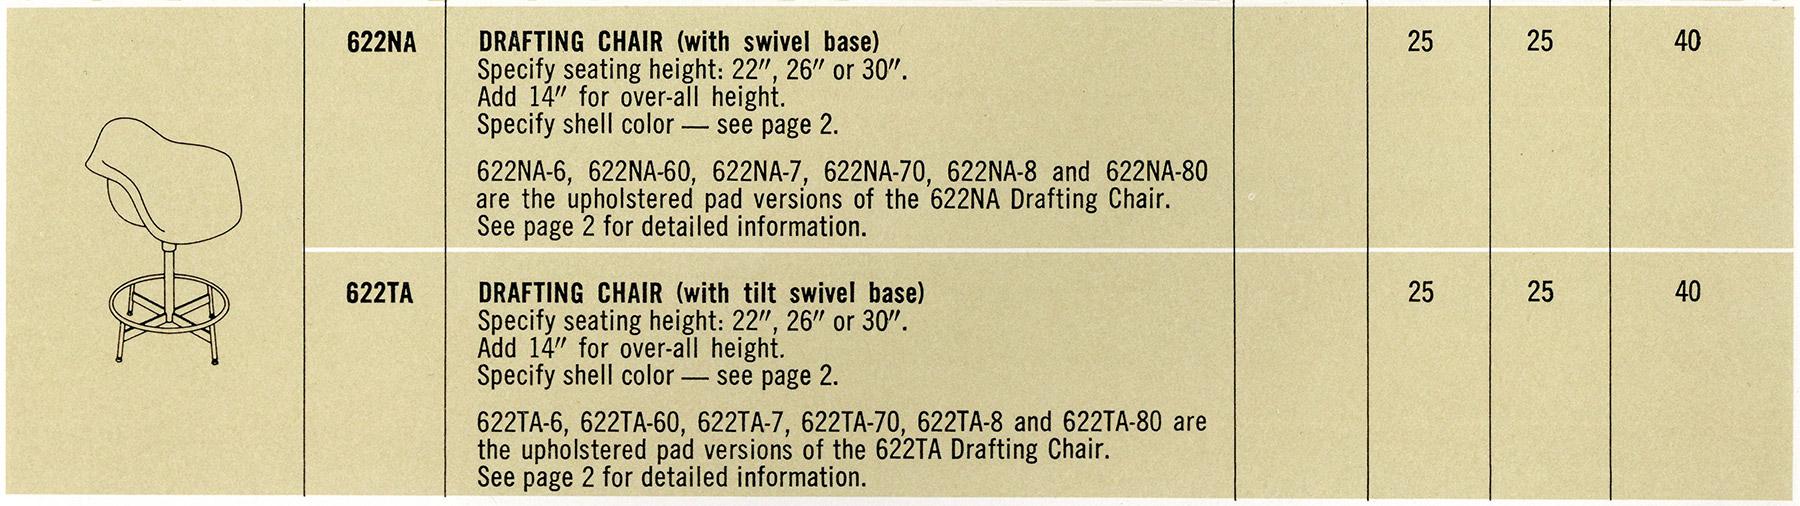 622NA-Specs.jpg